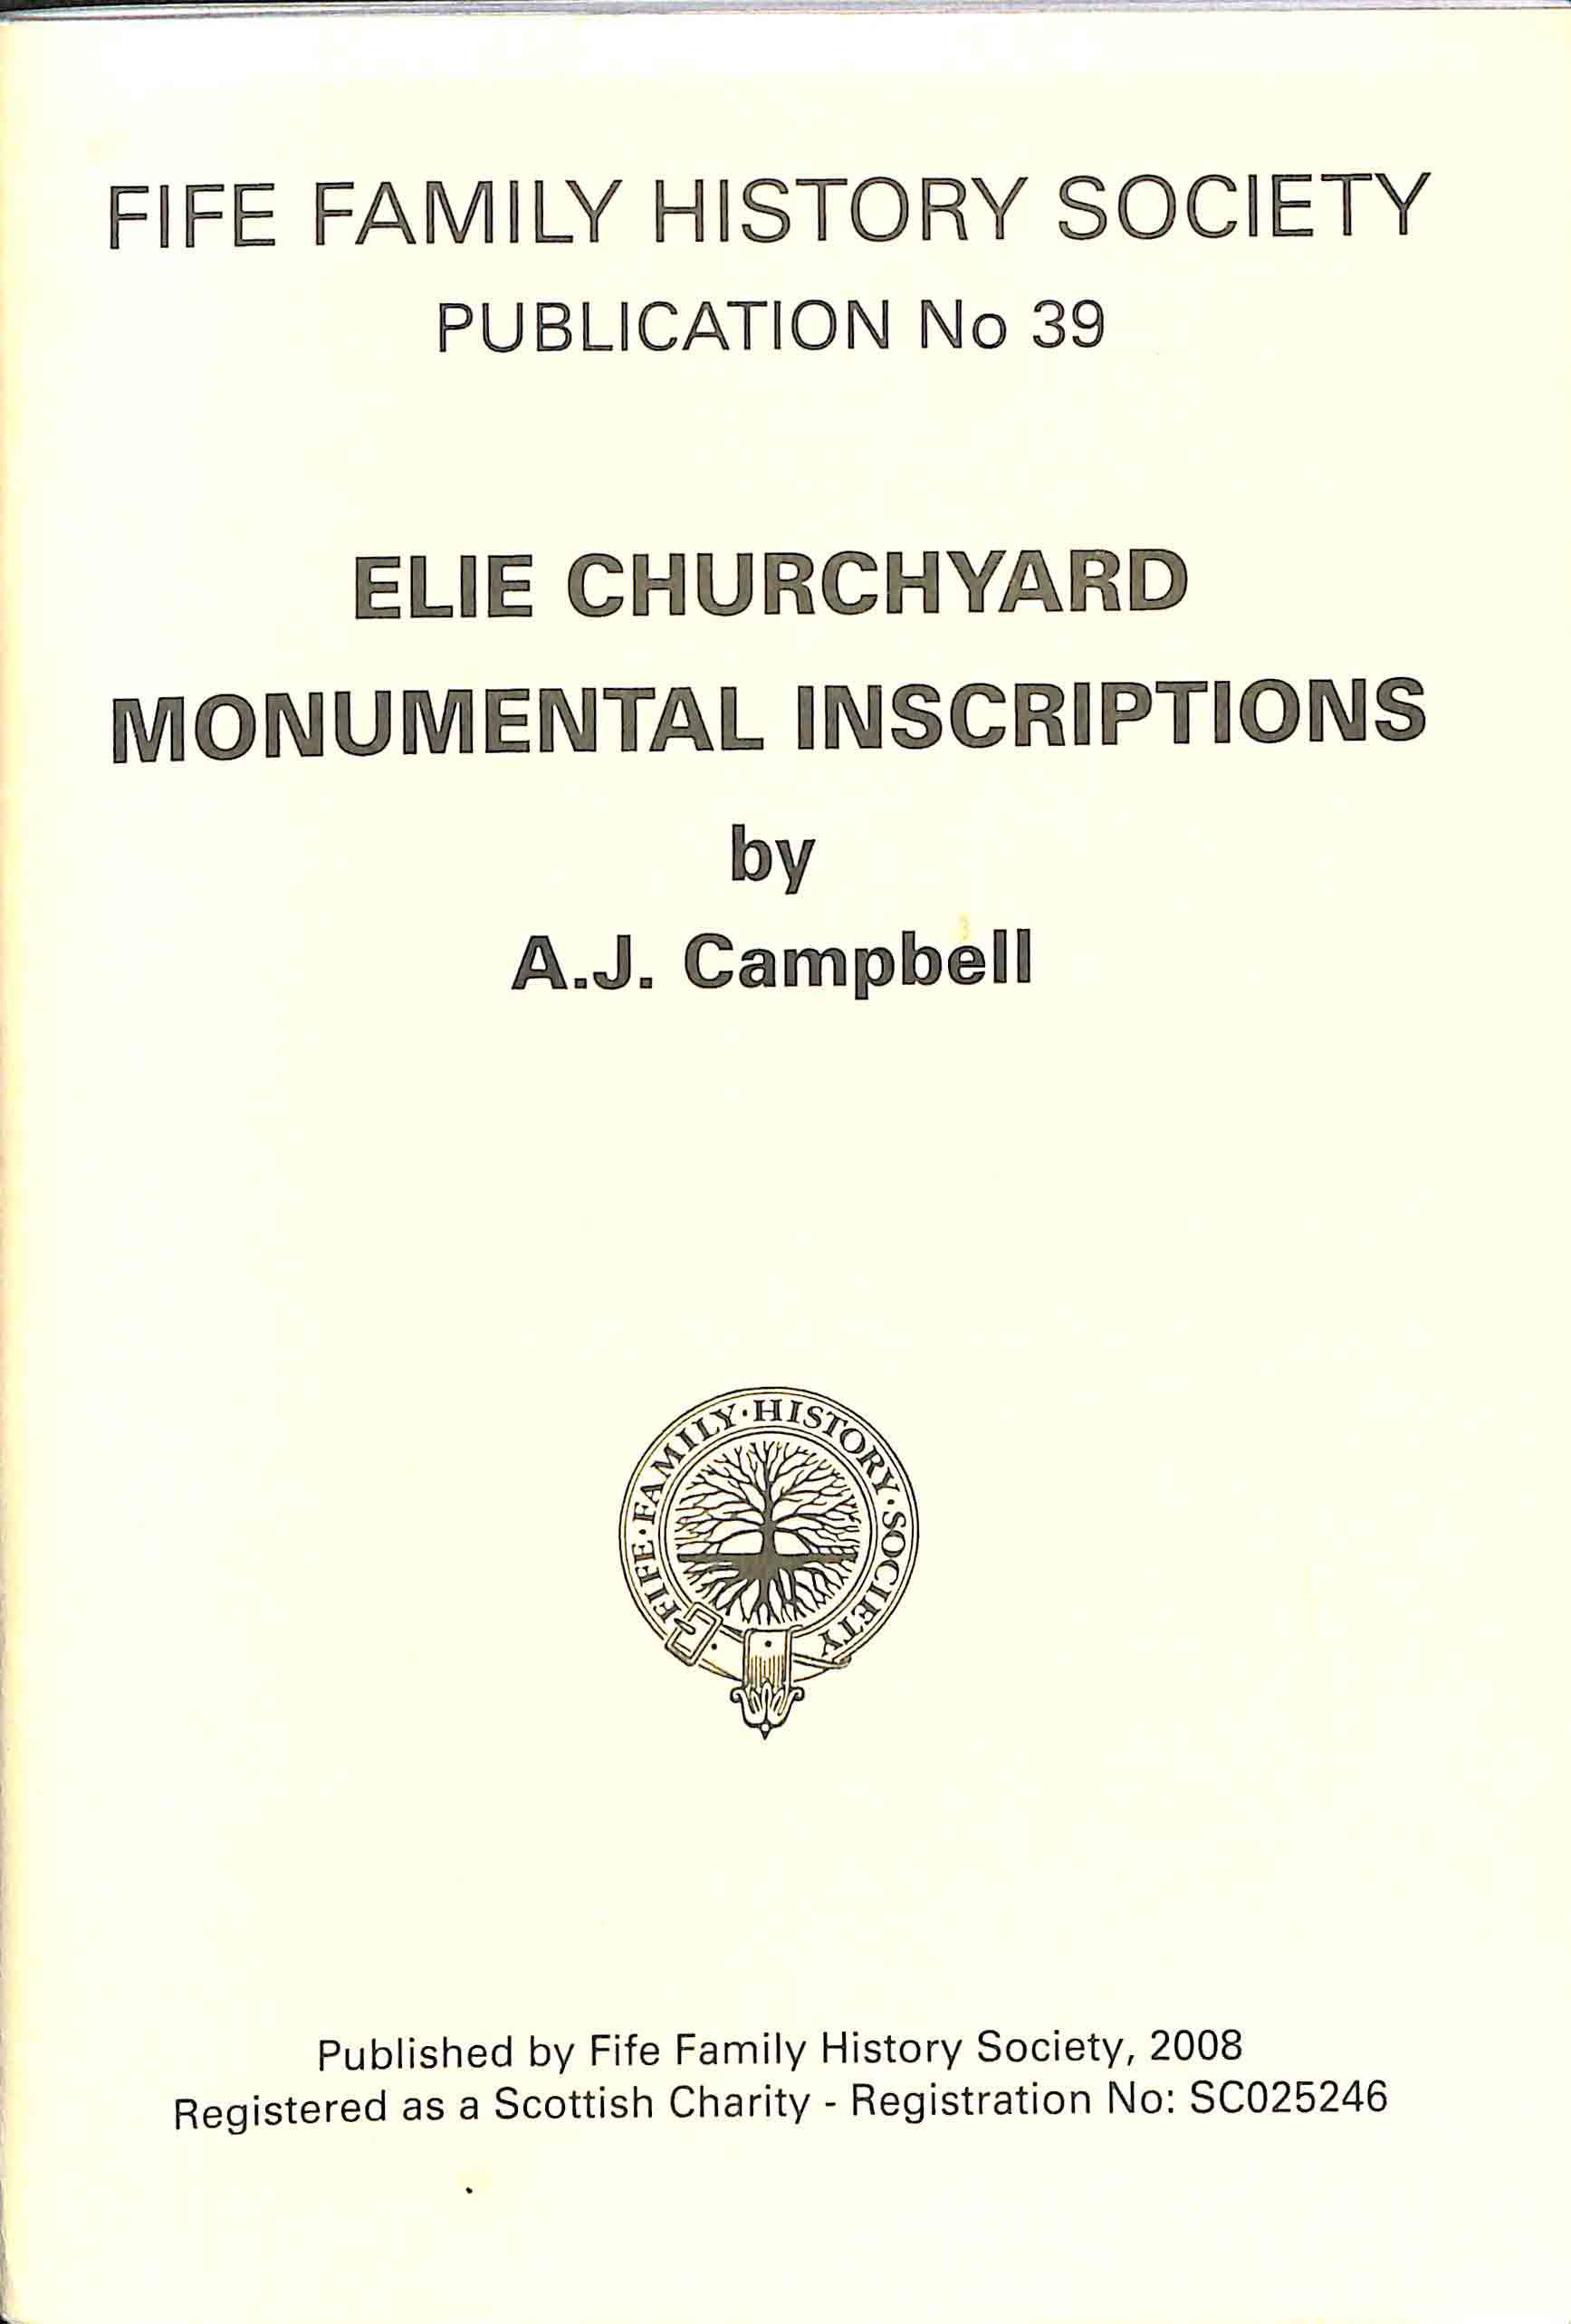 Publication No 39, Elie Churchyard Monumental Inscriptions